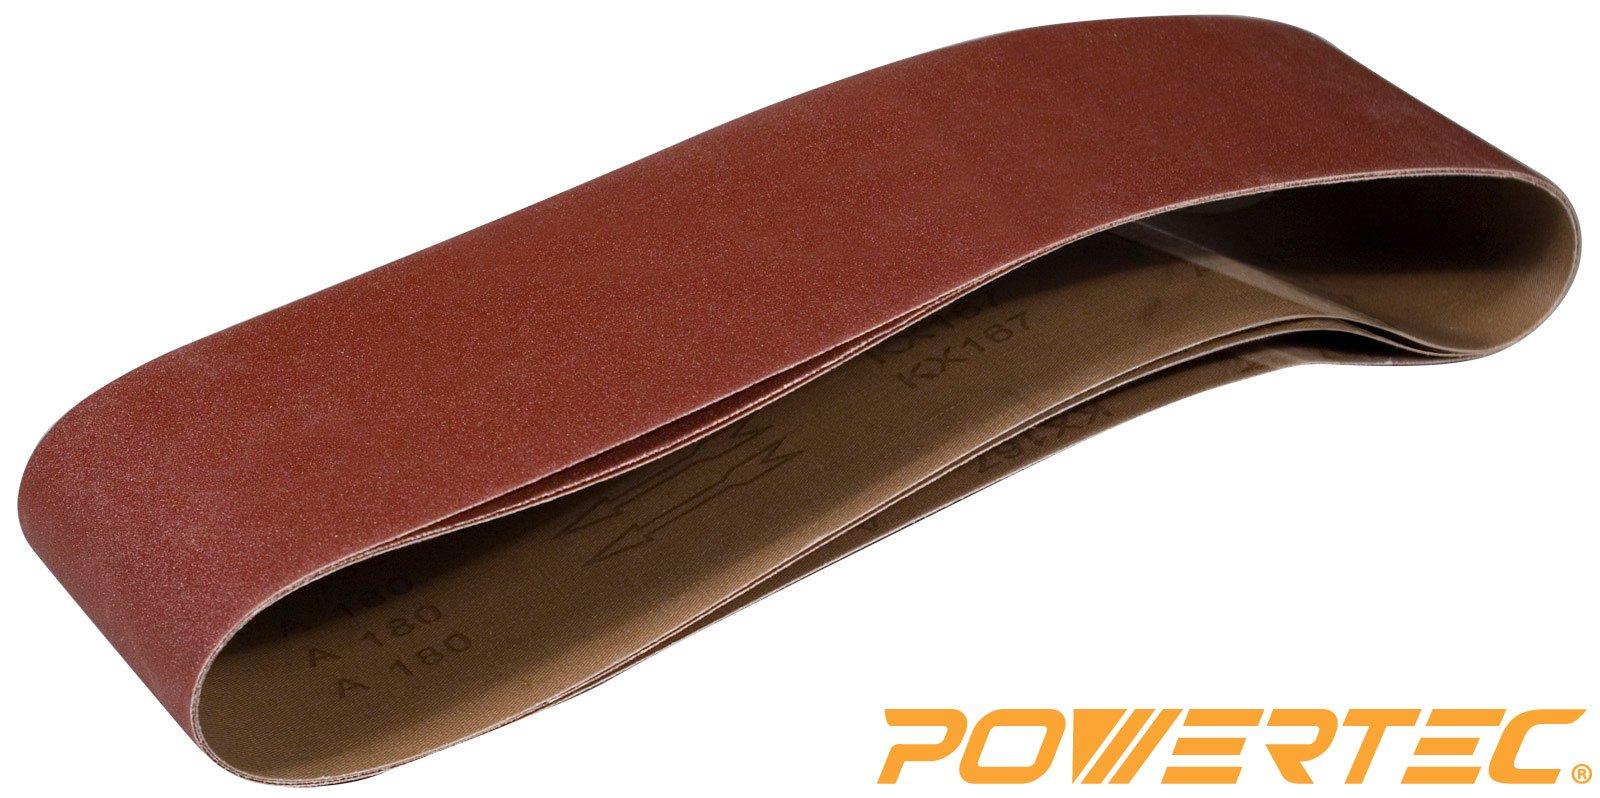 POWERTEC 110183 6-Inch x 48-Inch 100 Grit Aluminum Oxide Sanding Belt, 3-Pack by POWERTEC (Image #1)